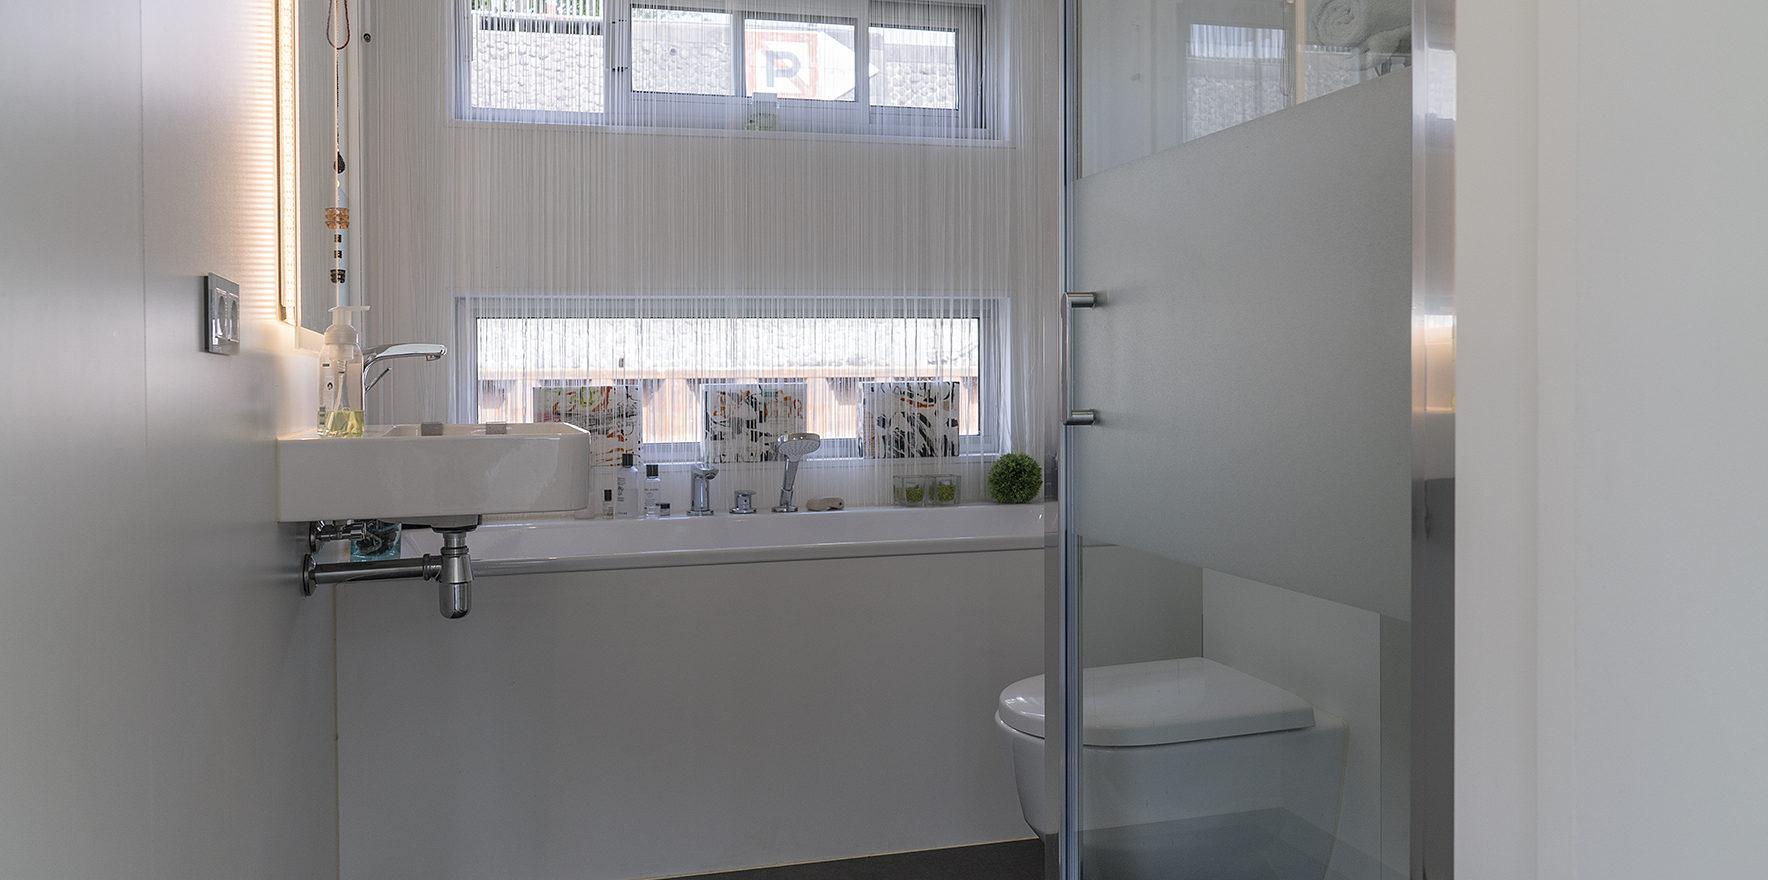 CrHo_Traveller_XL_Bathroom_100dpi Kopie